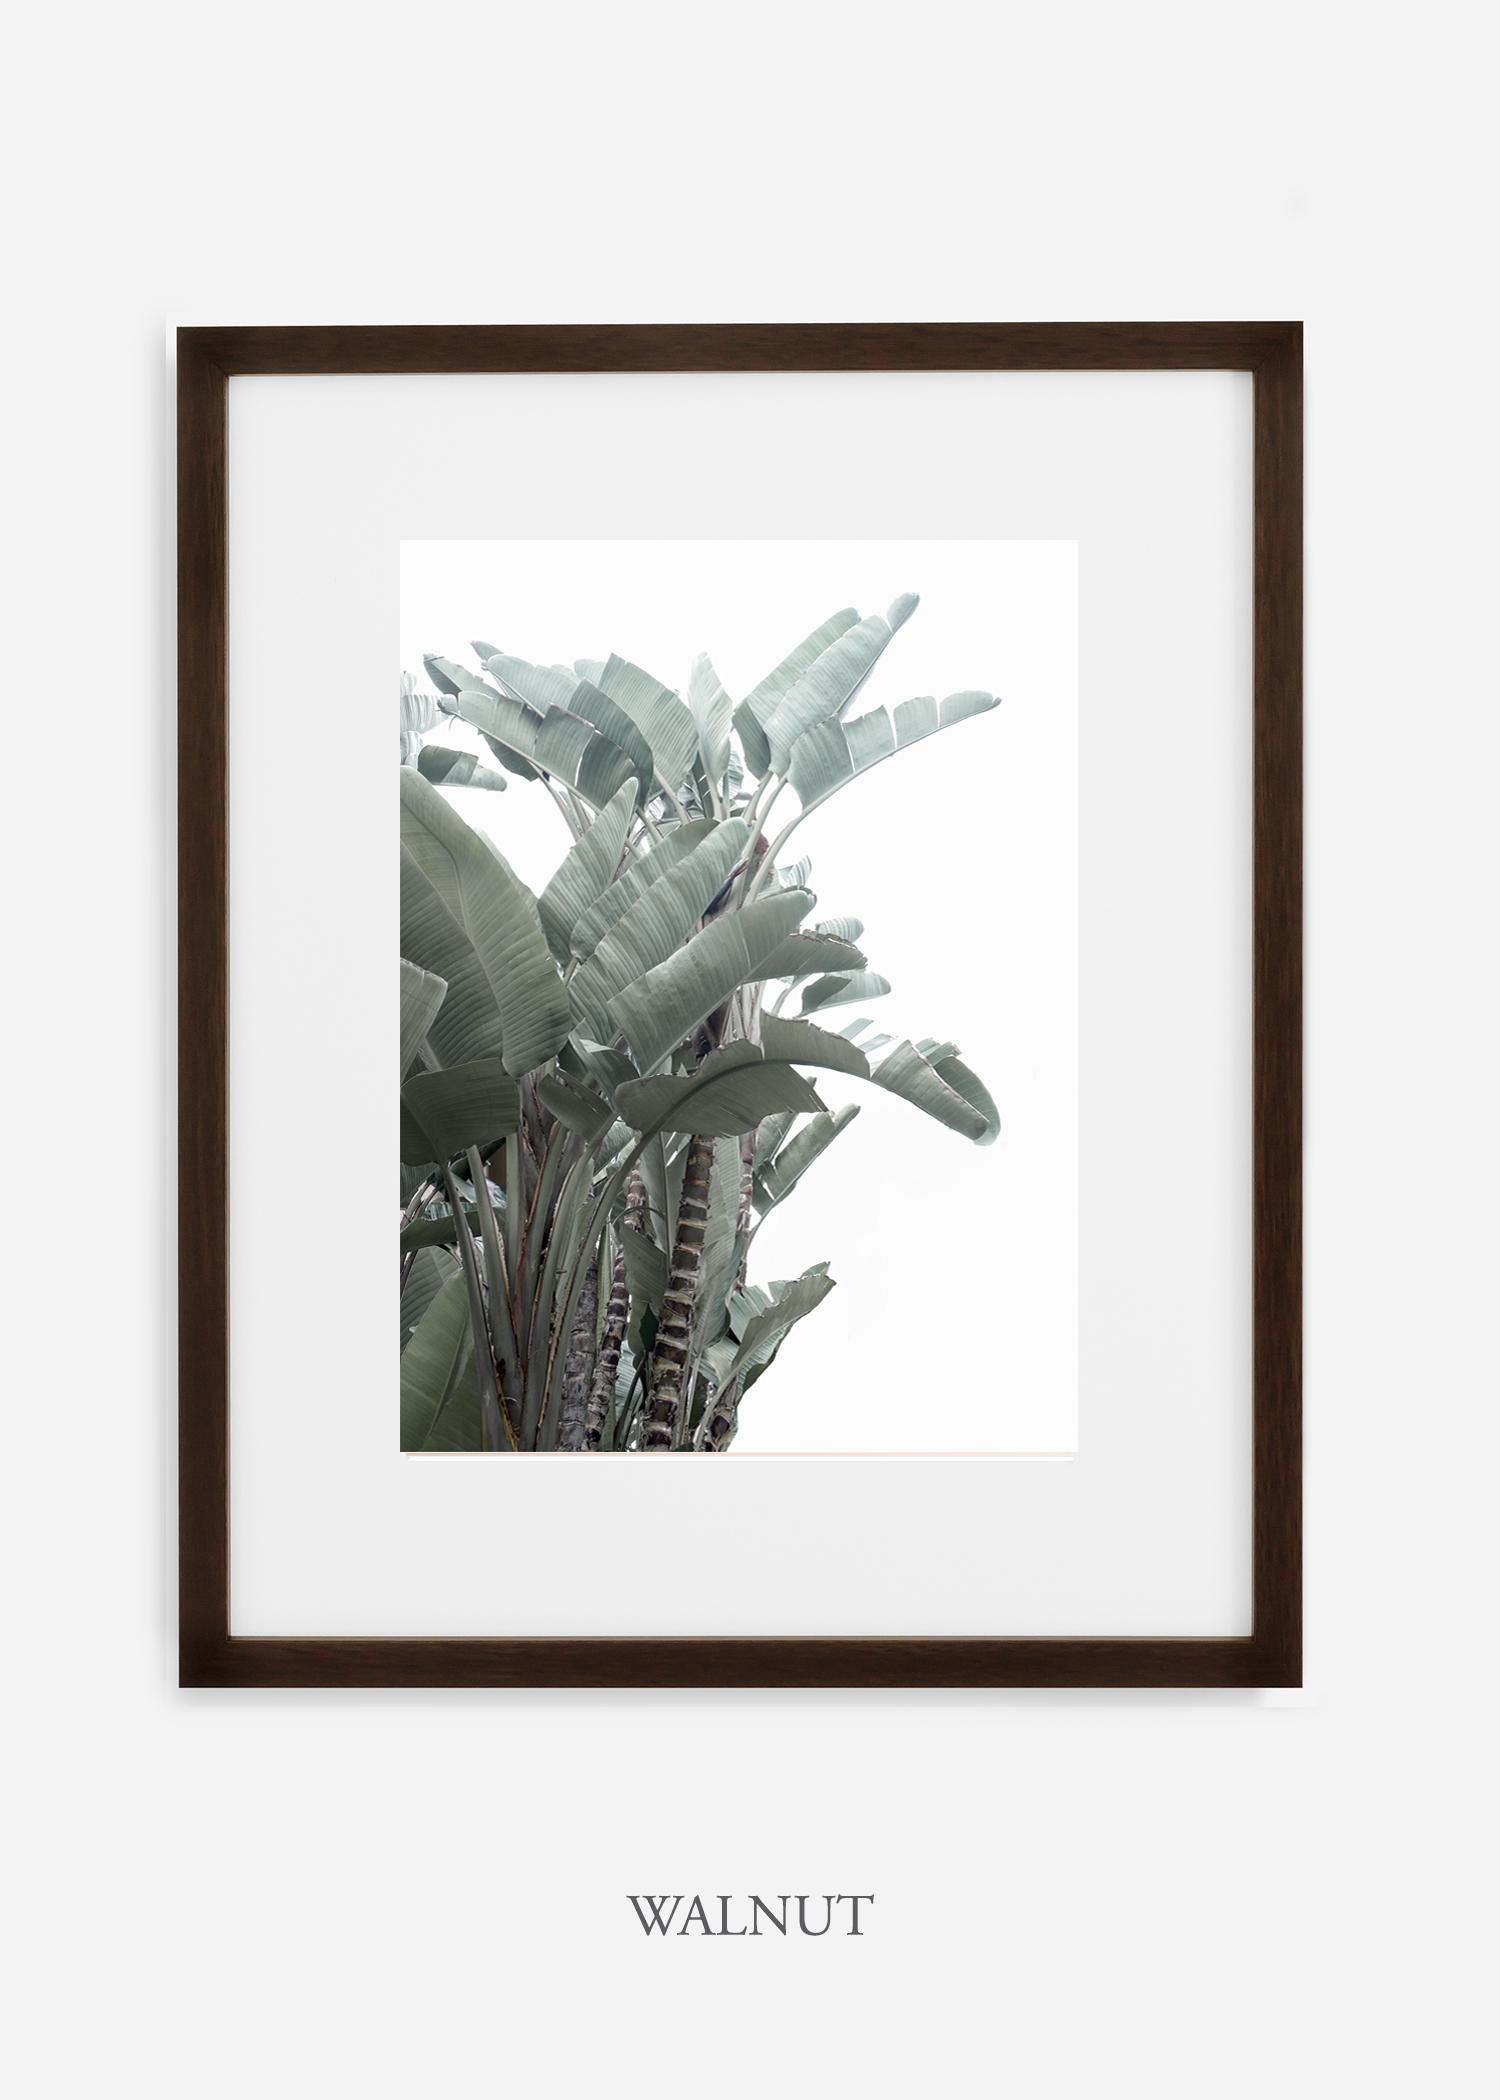 wildercalifornia_walnutframe_WinterWhite_BananaLeafNo.1_Tropical_LosAngeles_Art_HomeDecor_interiordesign_design.jpg